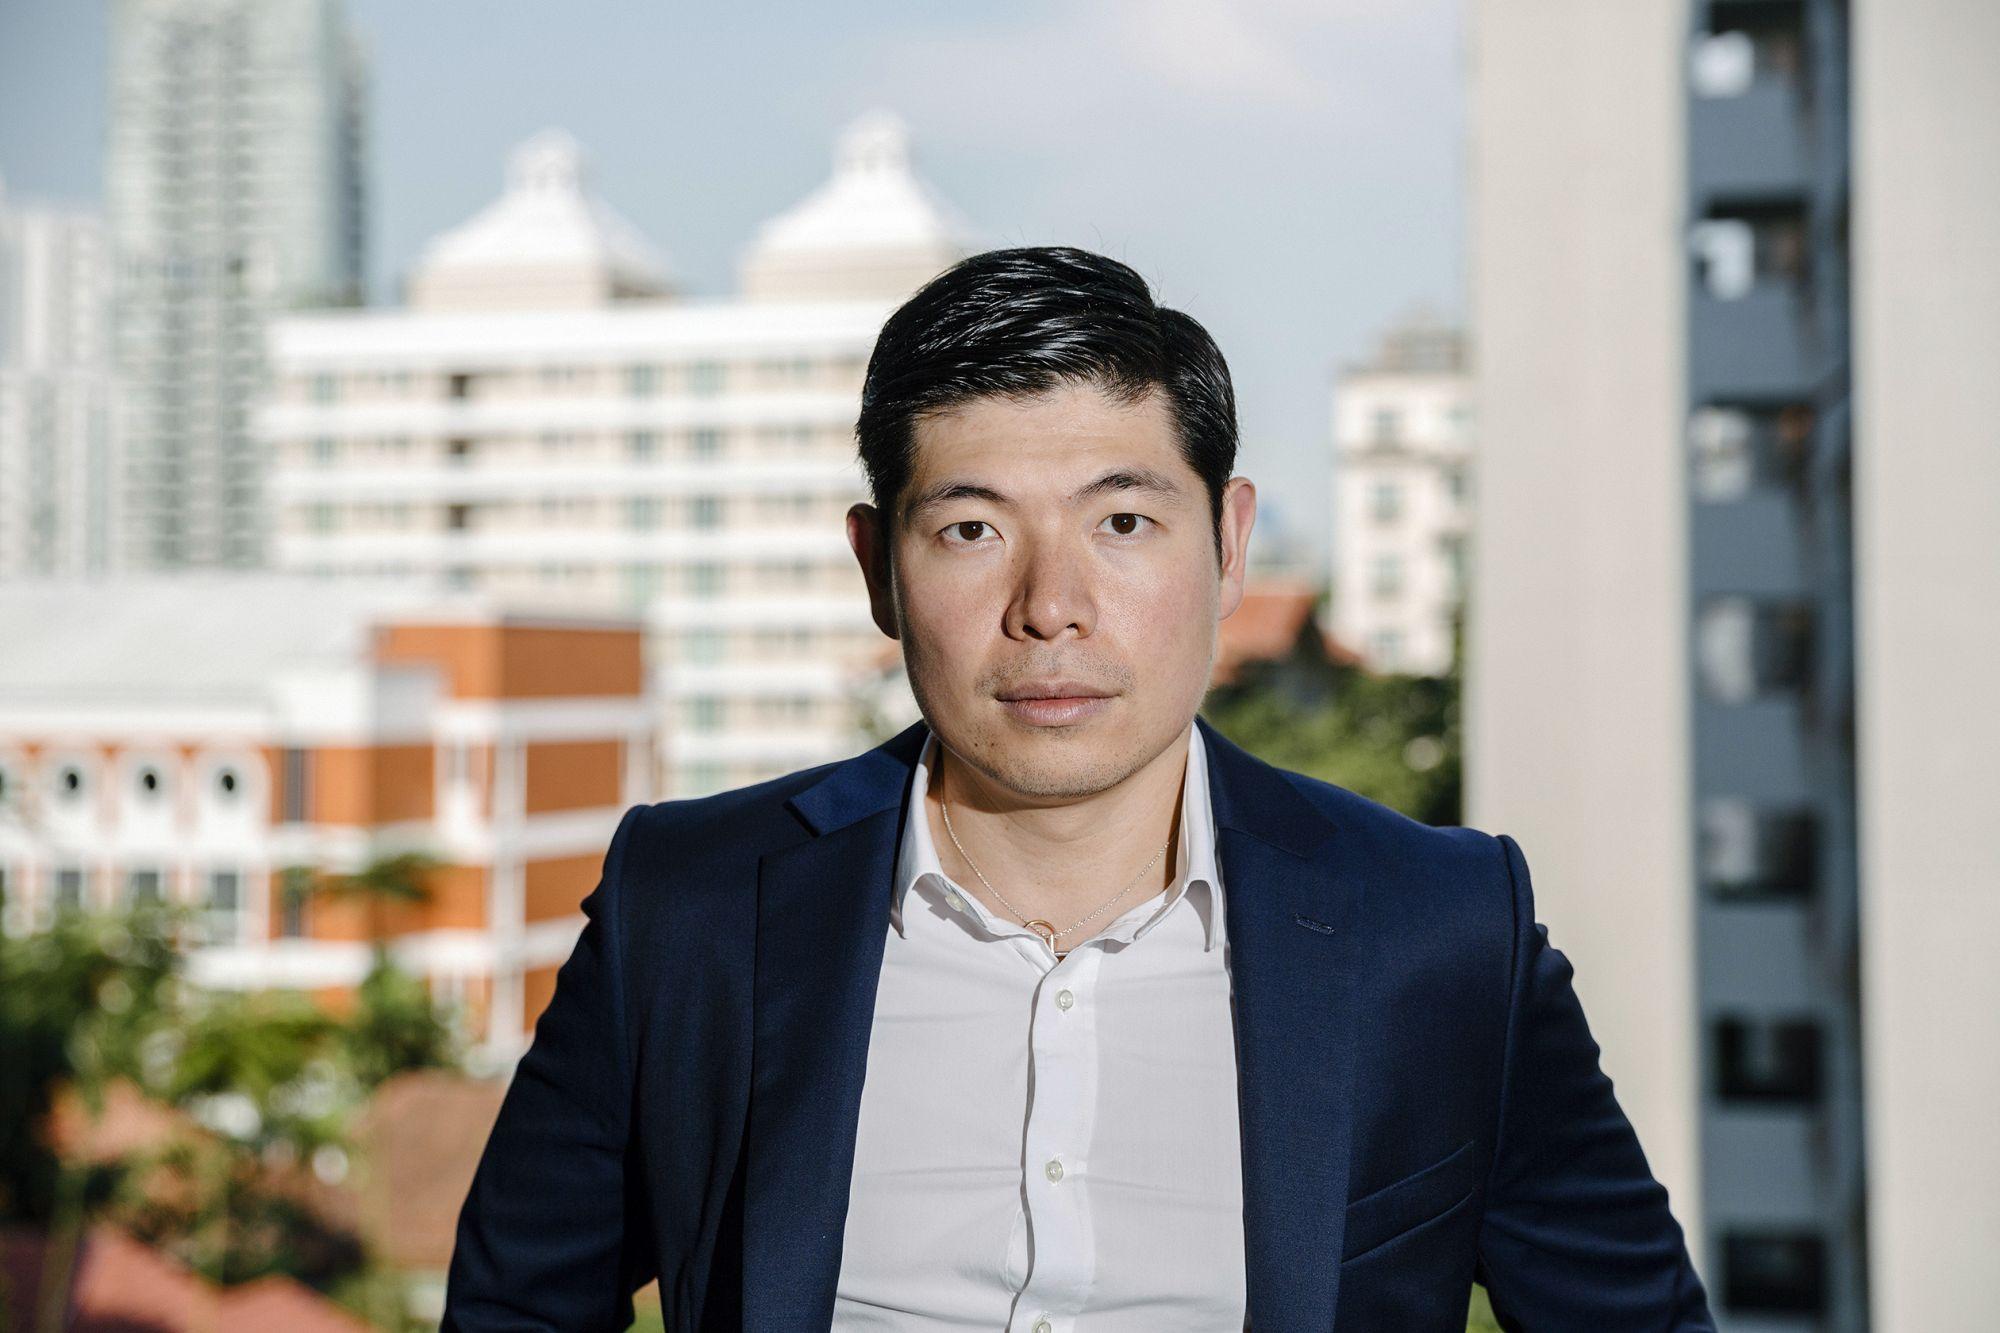 Grab收購Uber東南亞市場,五件你應該知道關於這件收購案